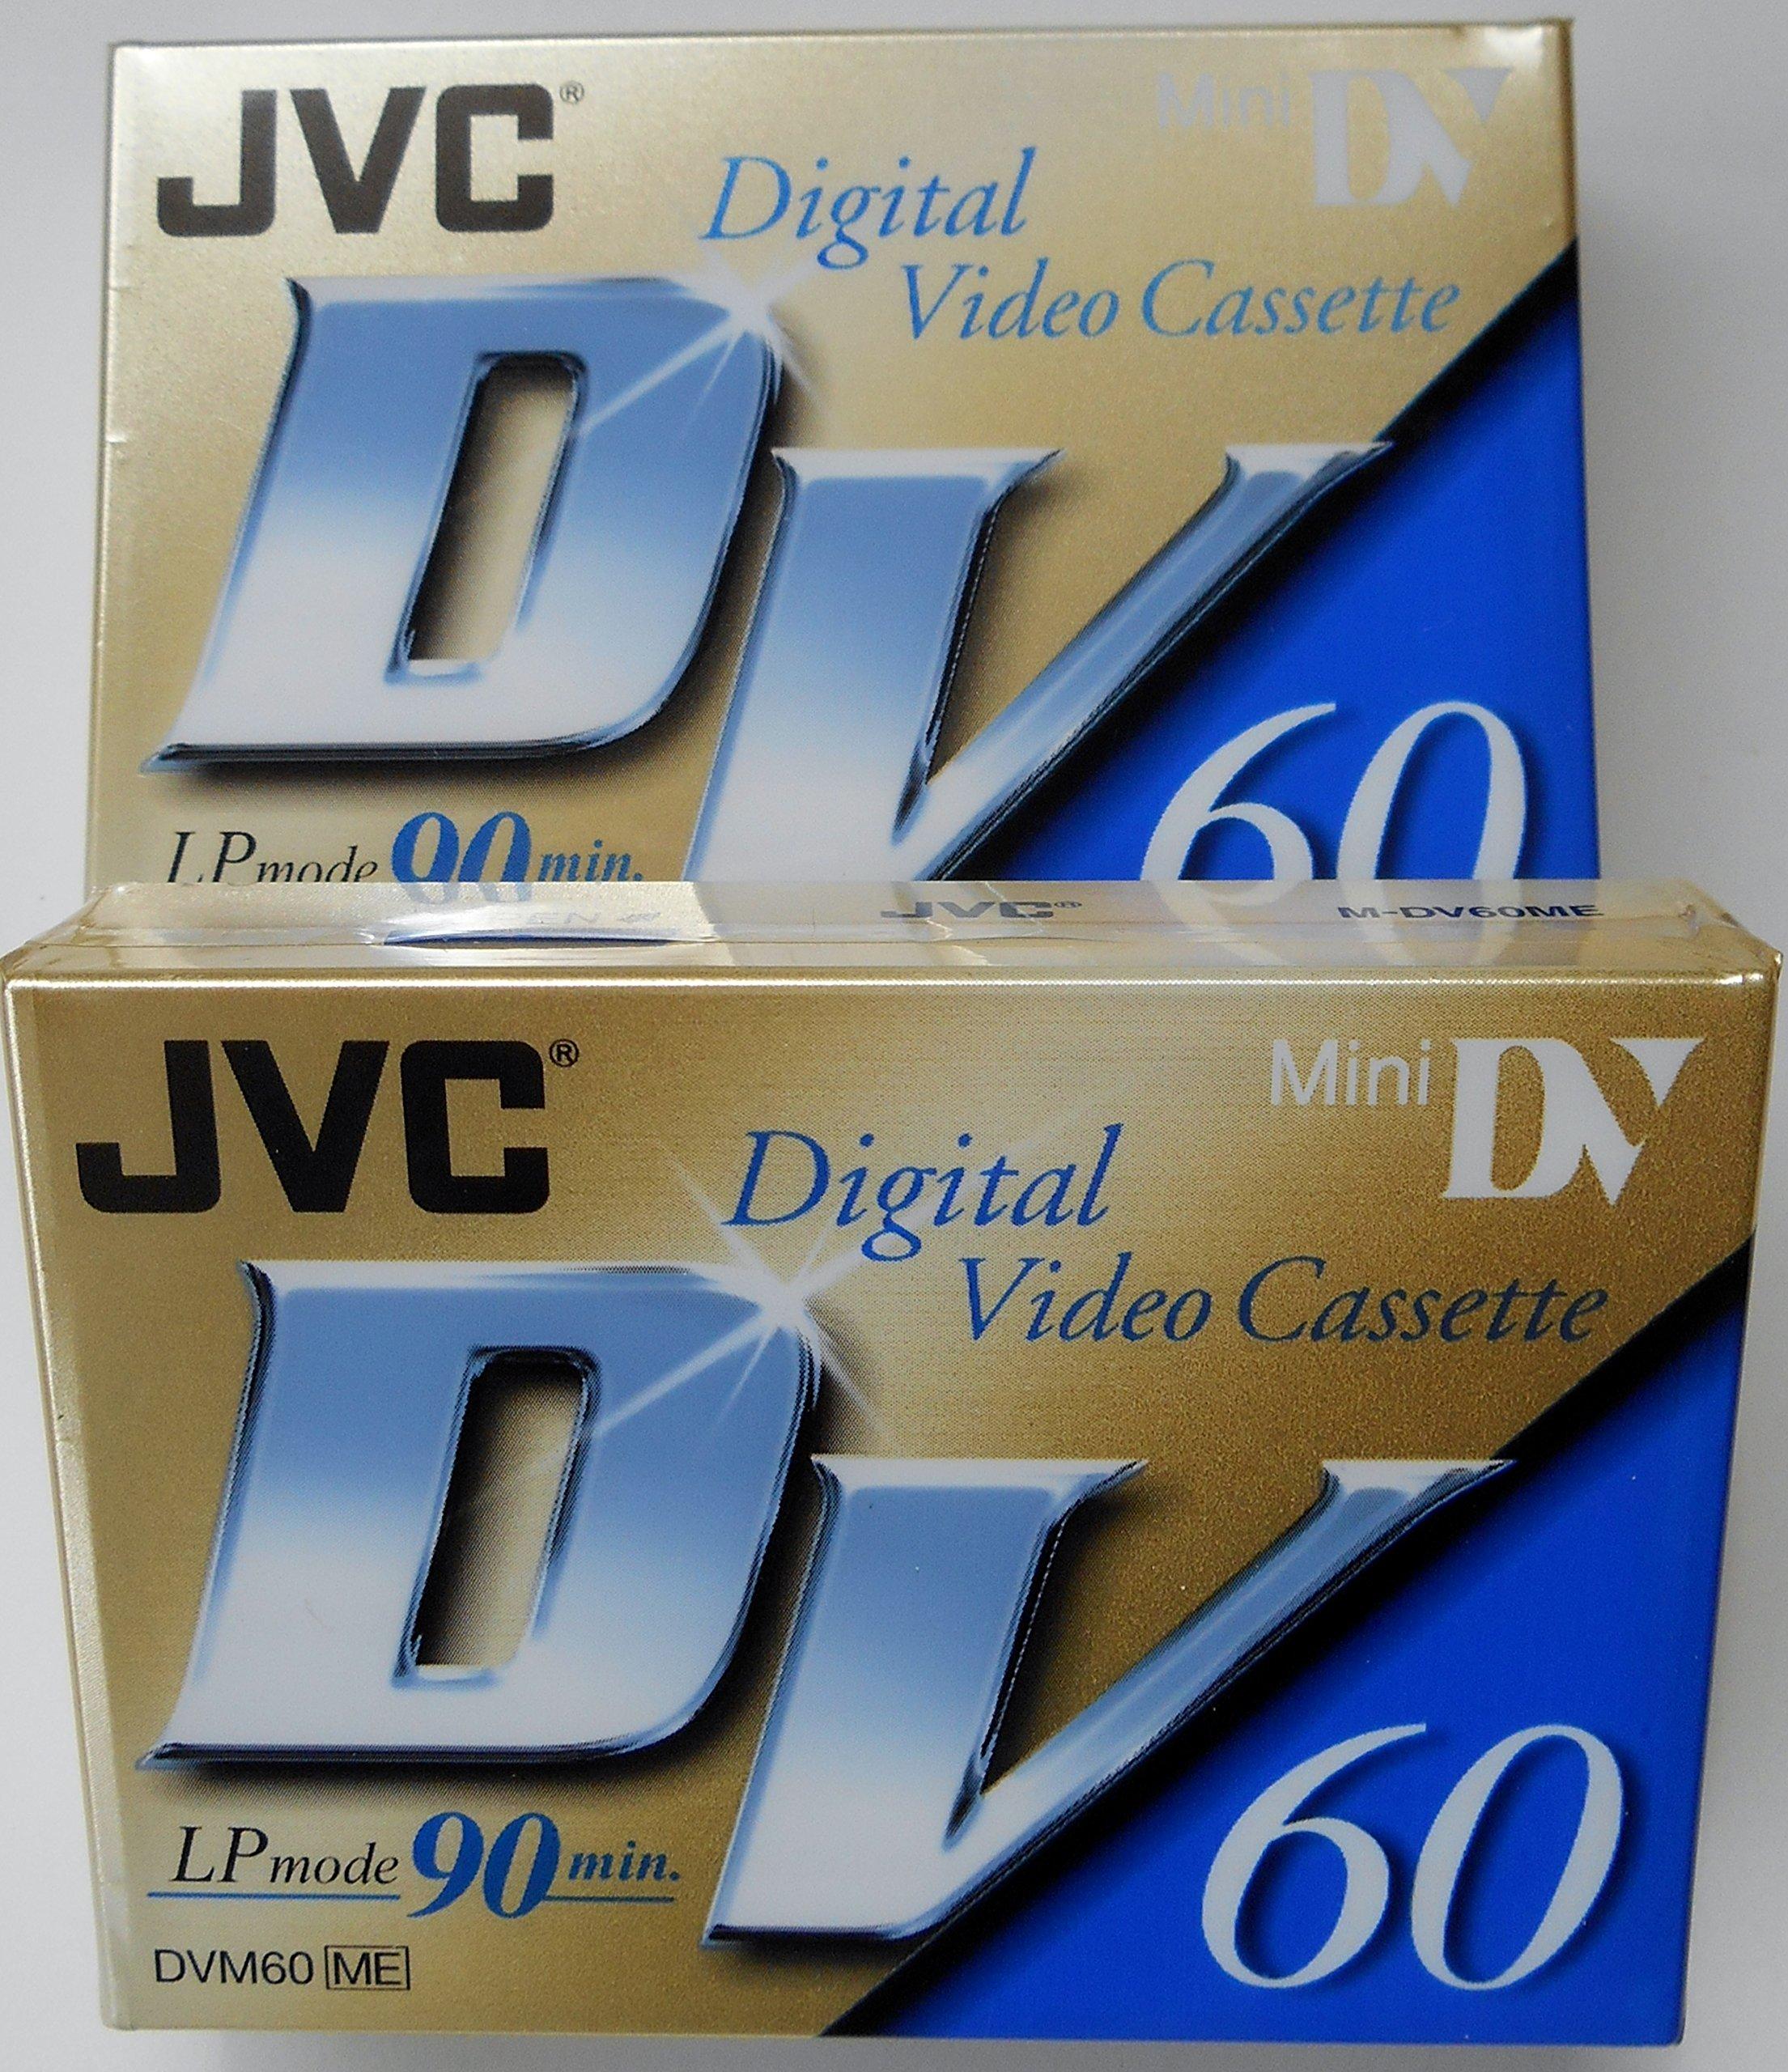 JVC Mini Digital Video Cassette, 2-Pack by JVC